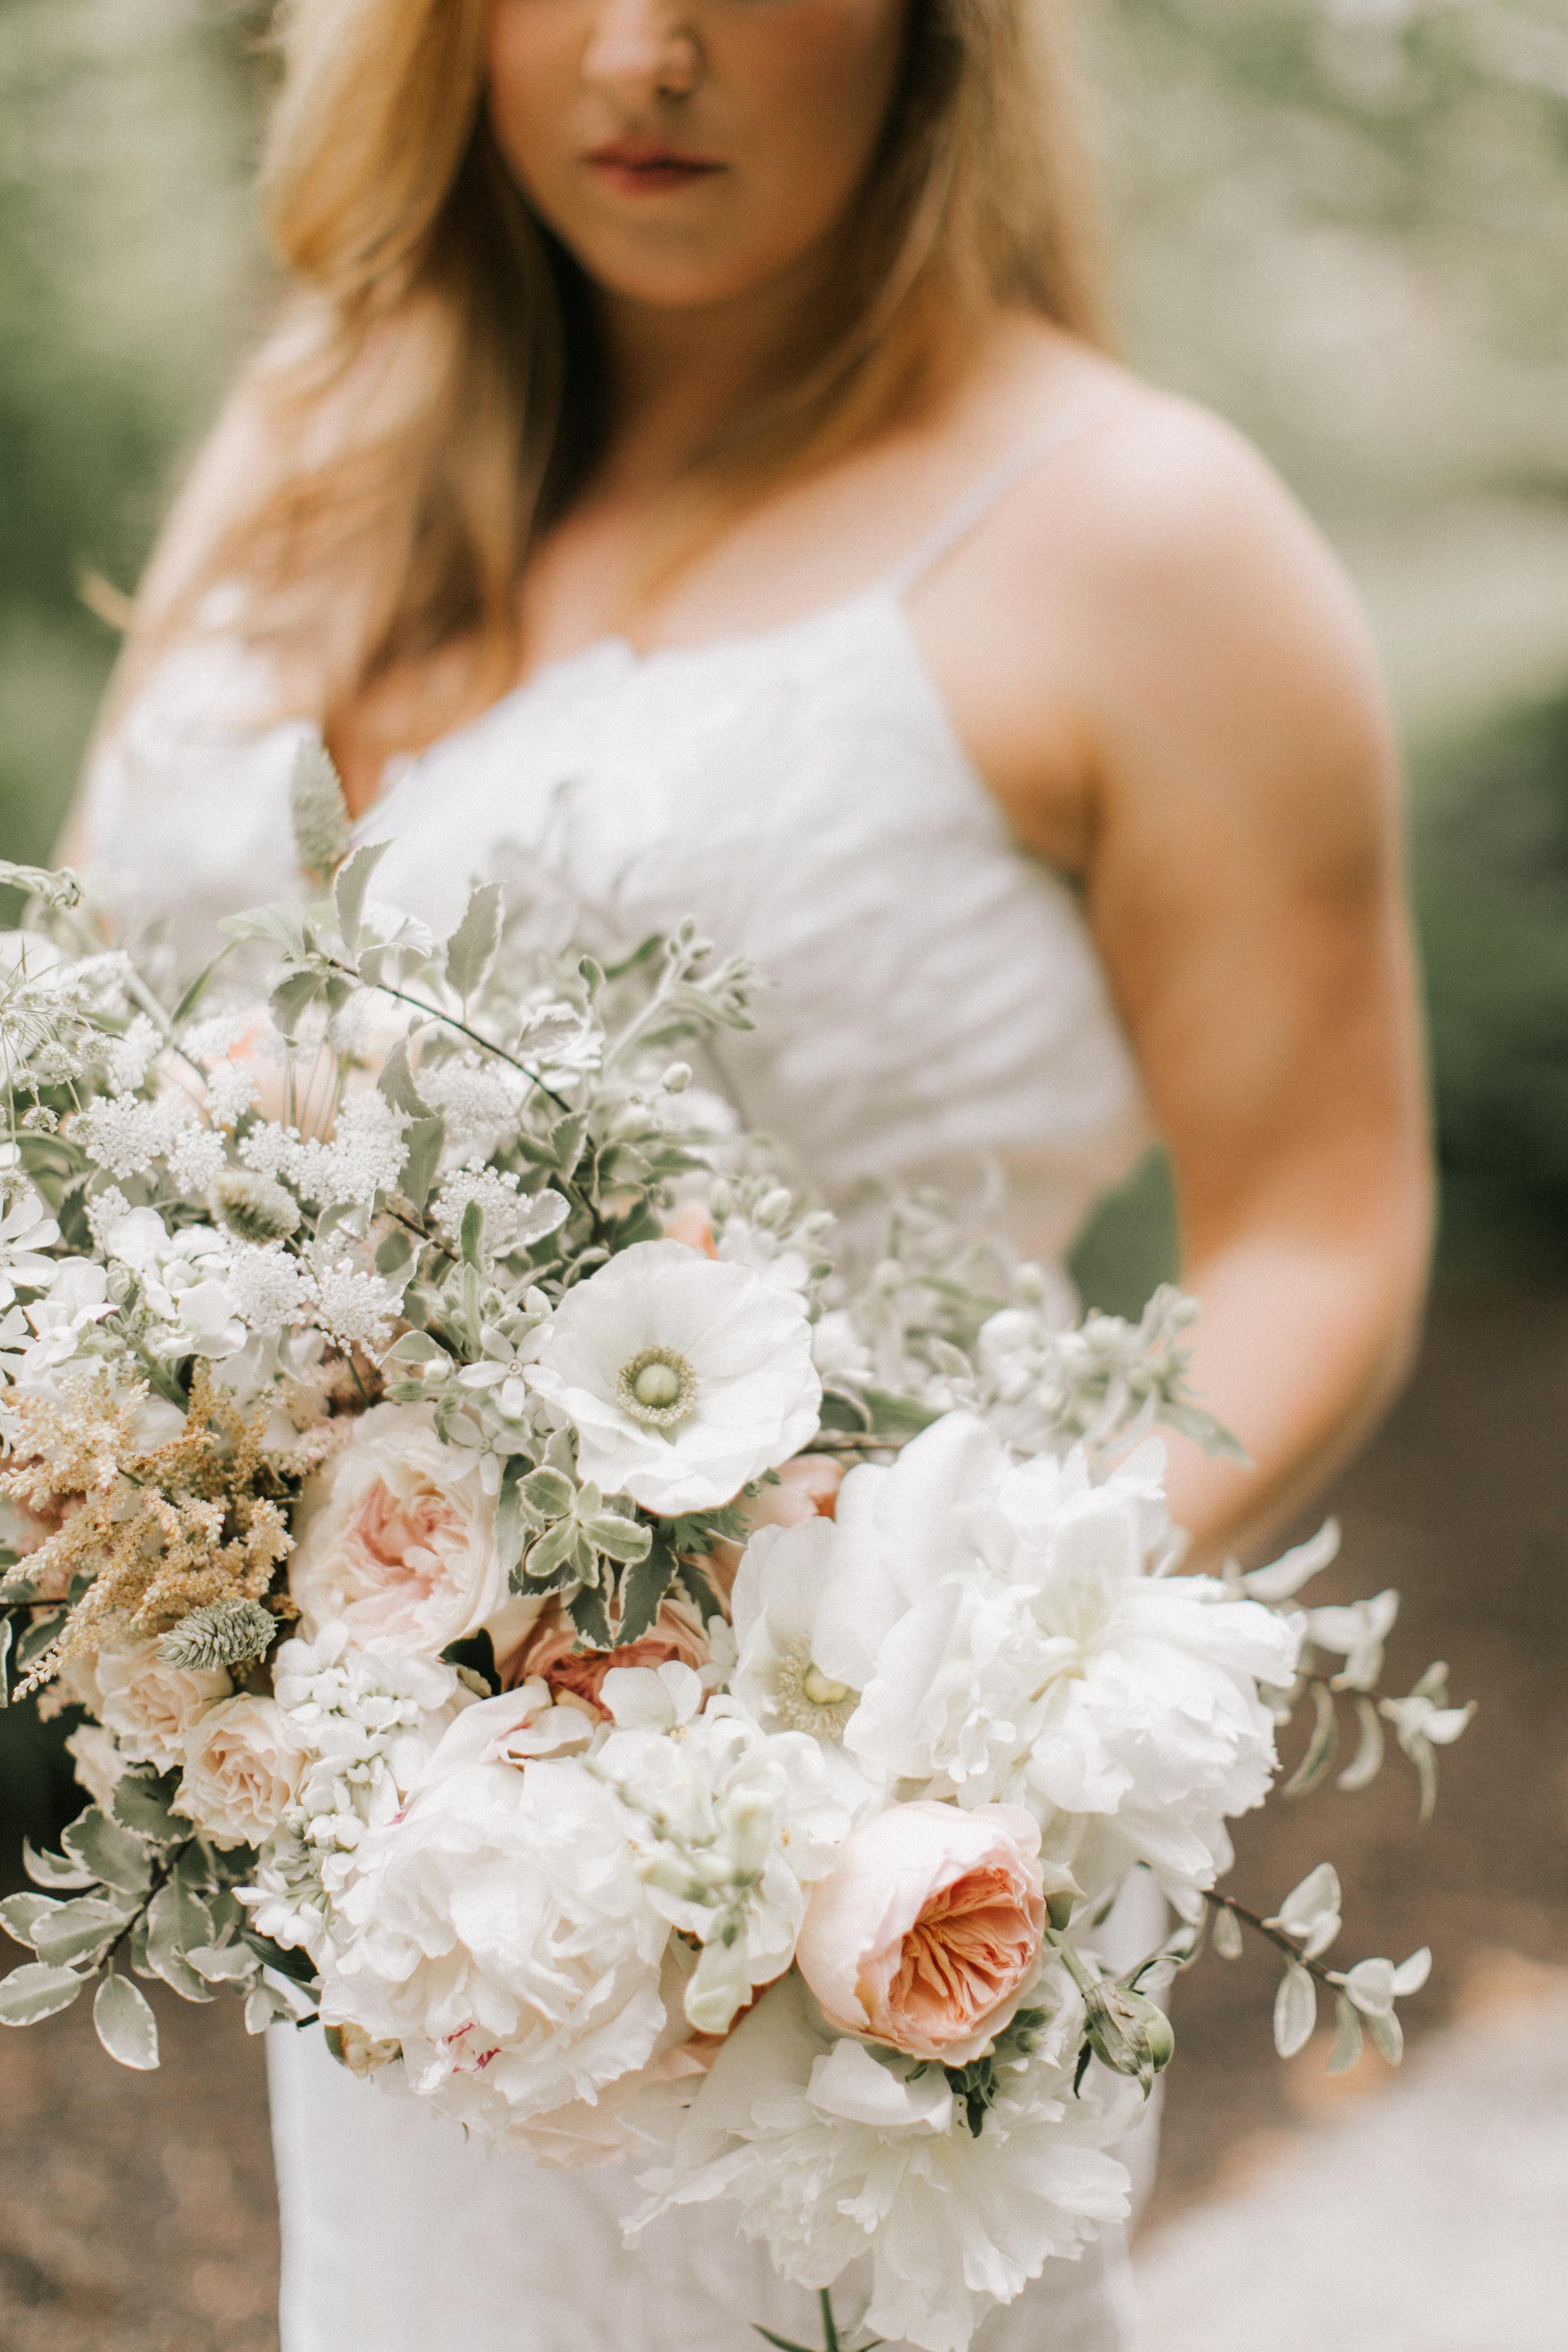 Watershed_Floral_Marianmade_Farm_Wedding_JamieMercurioPhoto2018-127.jpg